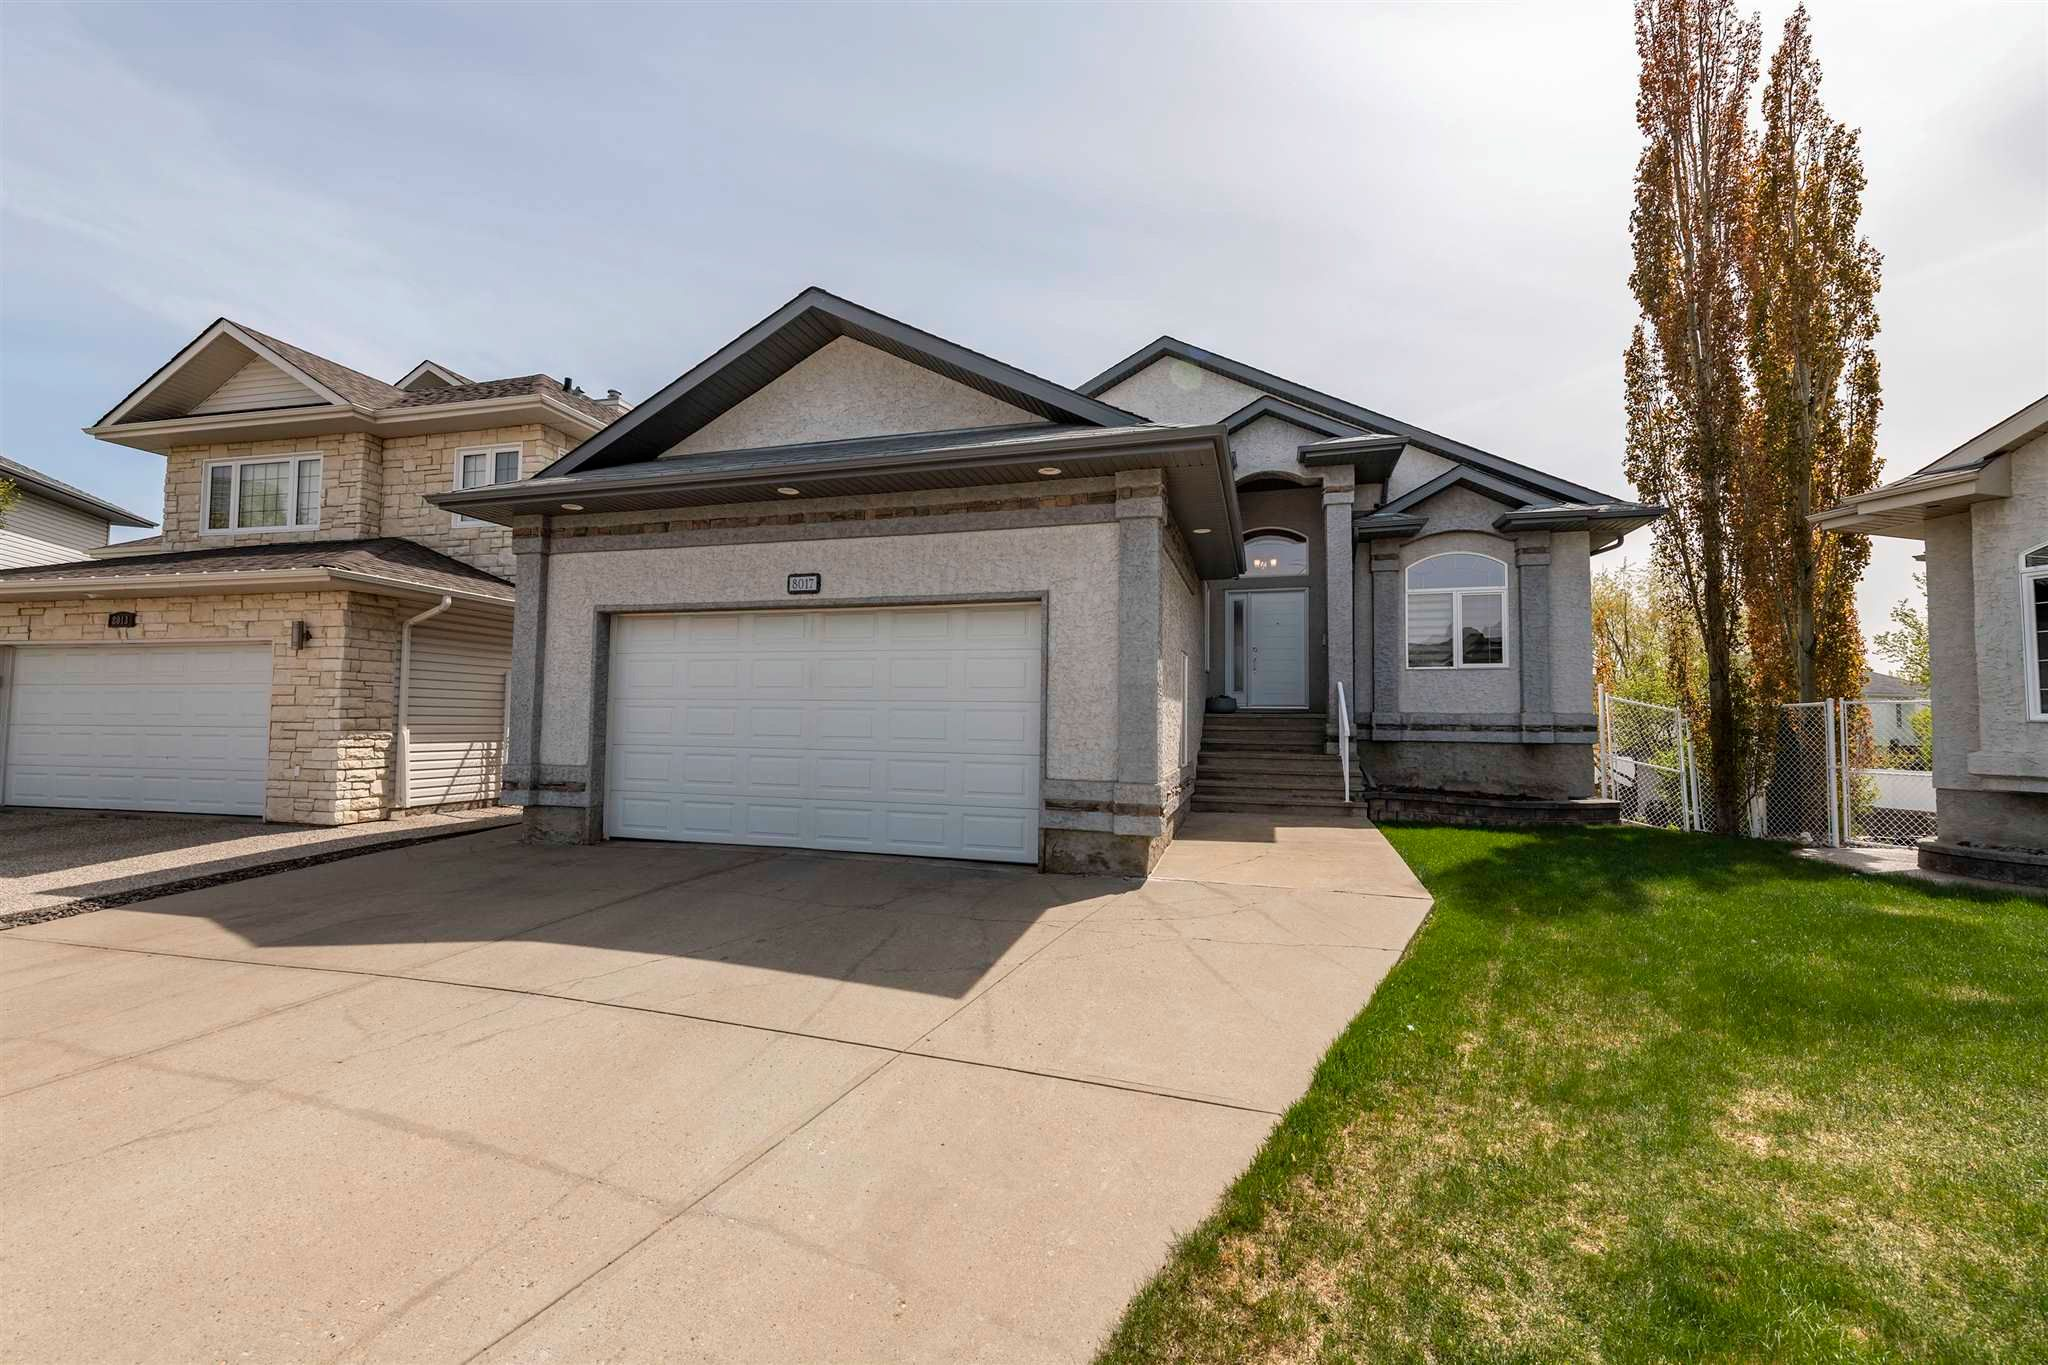 Main Photo: 8017 166A Avenue in Edmonton: Zone 28 Attached Home for sale : MLS®# E4246009